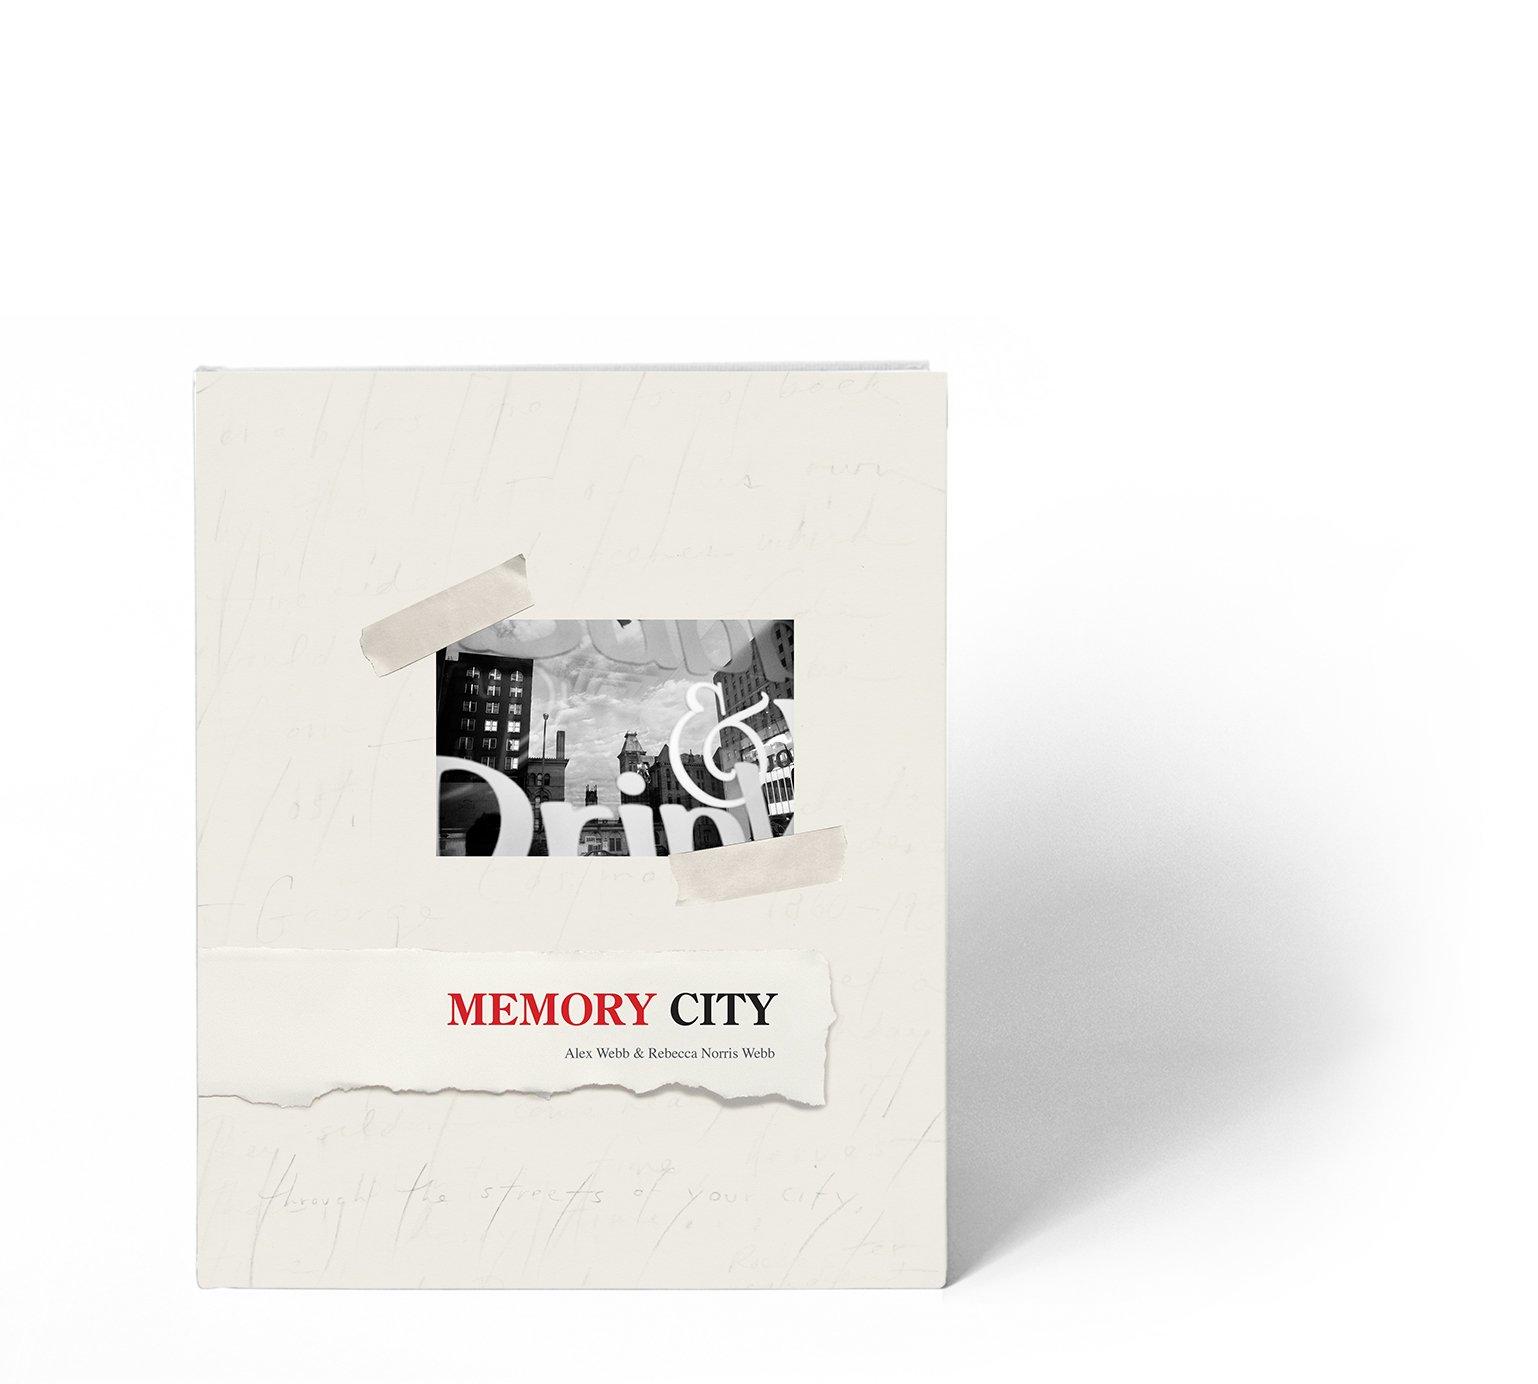 Memory City: The Fading Days of Film: Amazon.co.uk: Alex Webb, Rebecca Norris Webb: Books